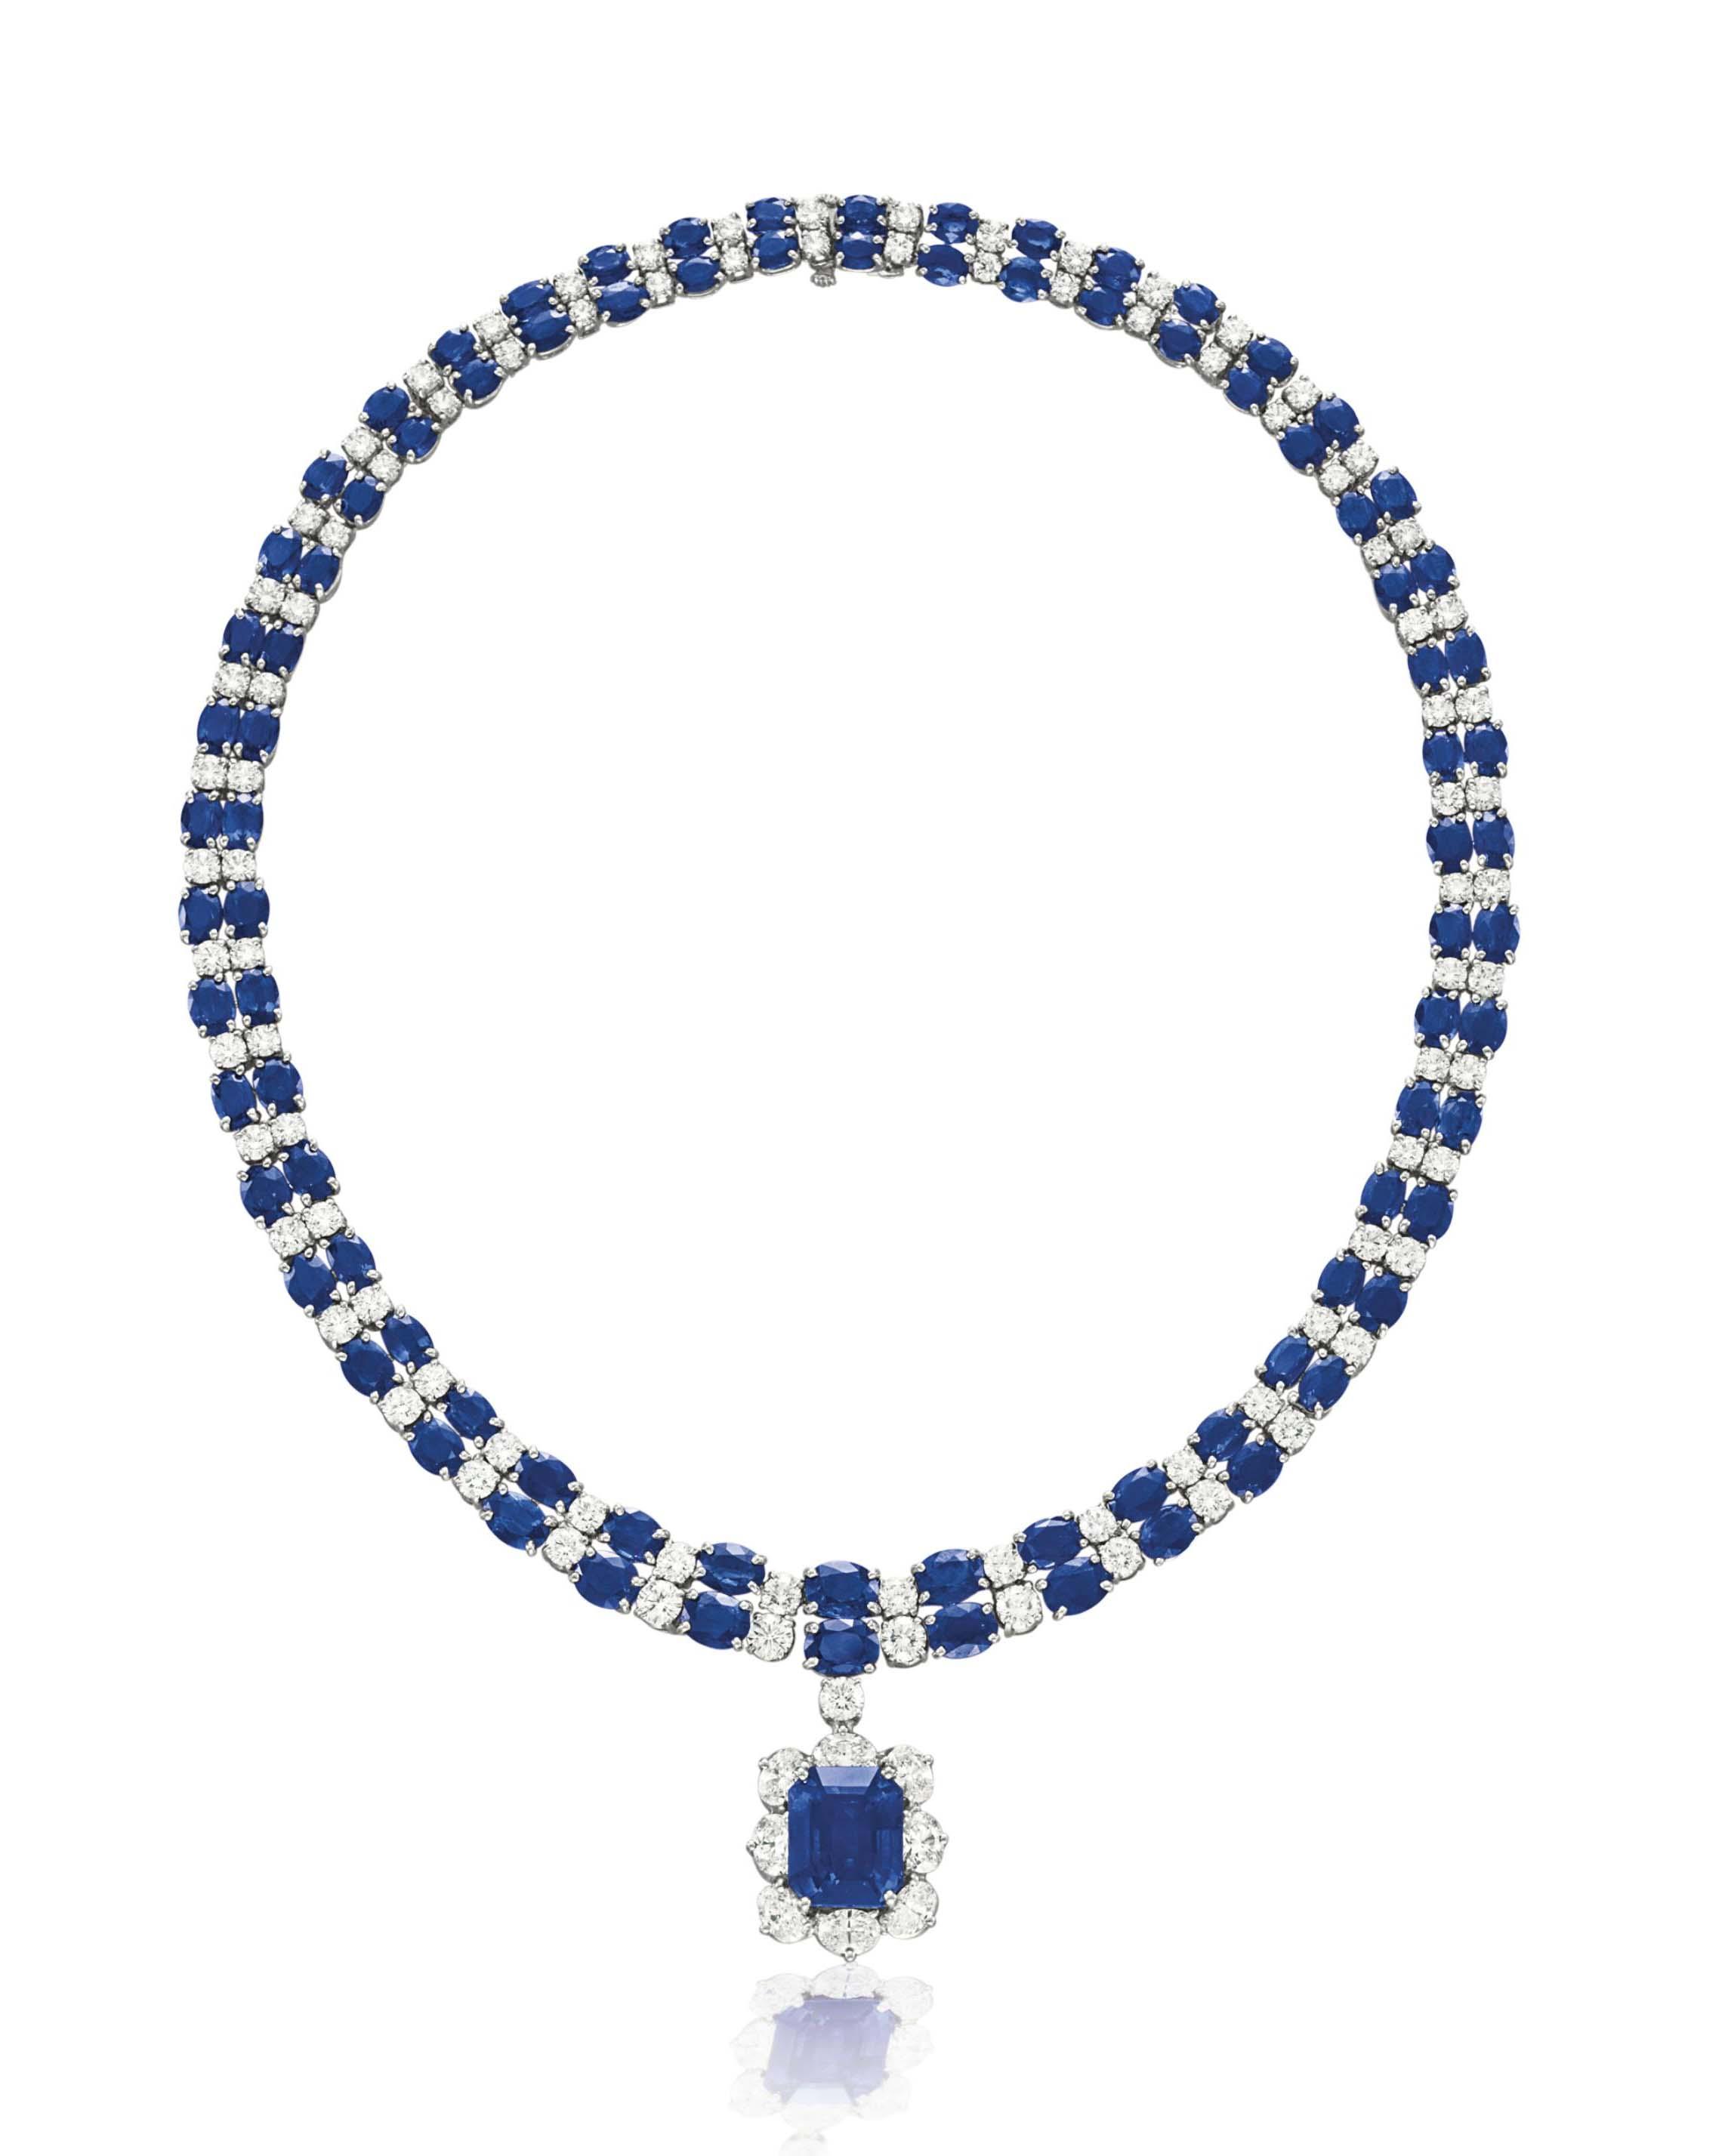 A SAPPHIRE AND DIAMOND NECKLACE, BY OSCAR HEYMAN & BROTHERS